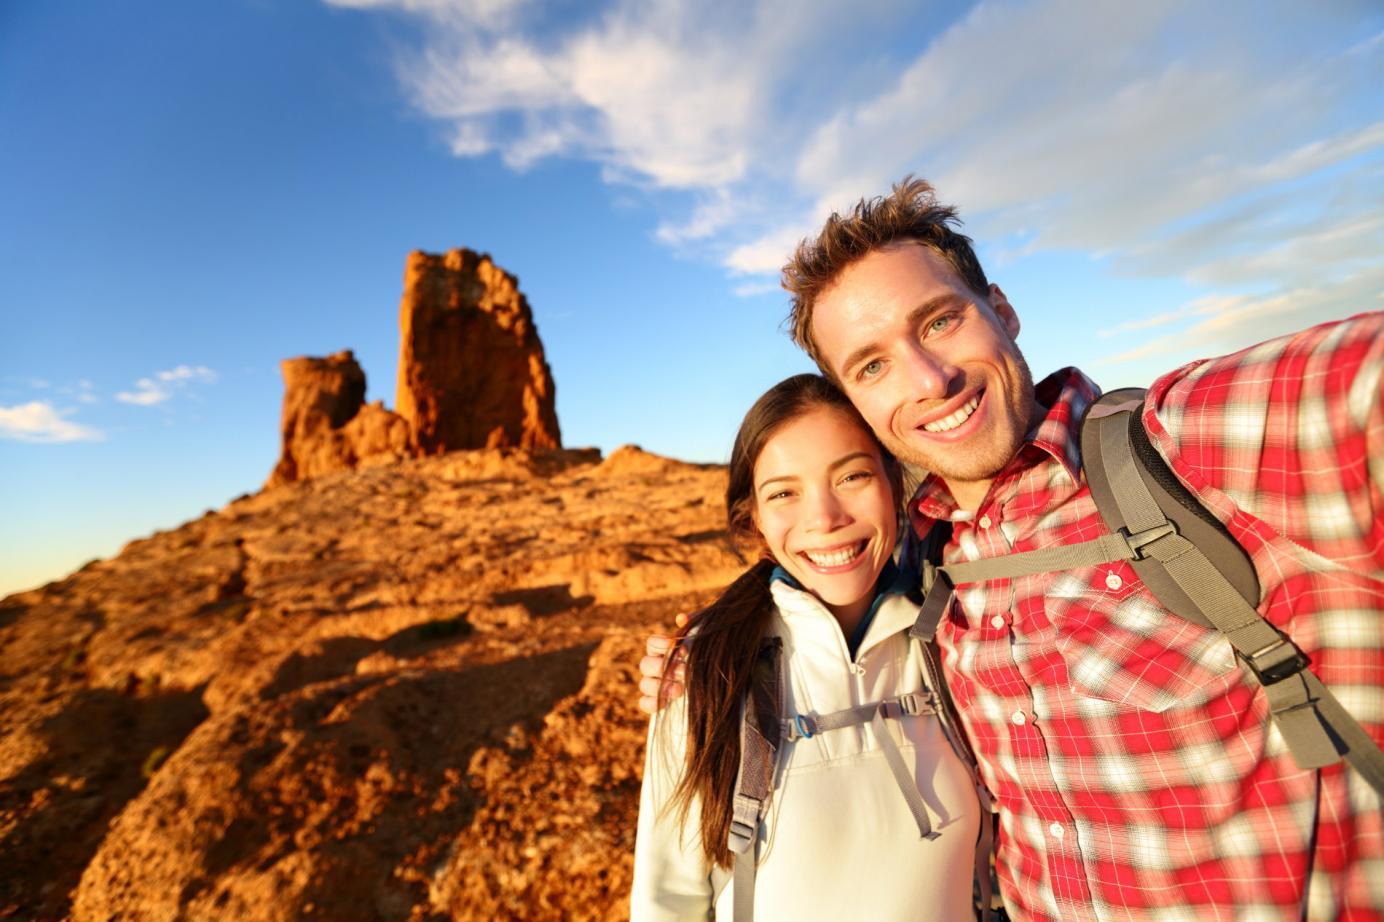 ser-flexibles-preparate-para-tu-primer-viaje-en-pareja-portal-luna-de-miel